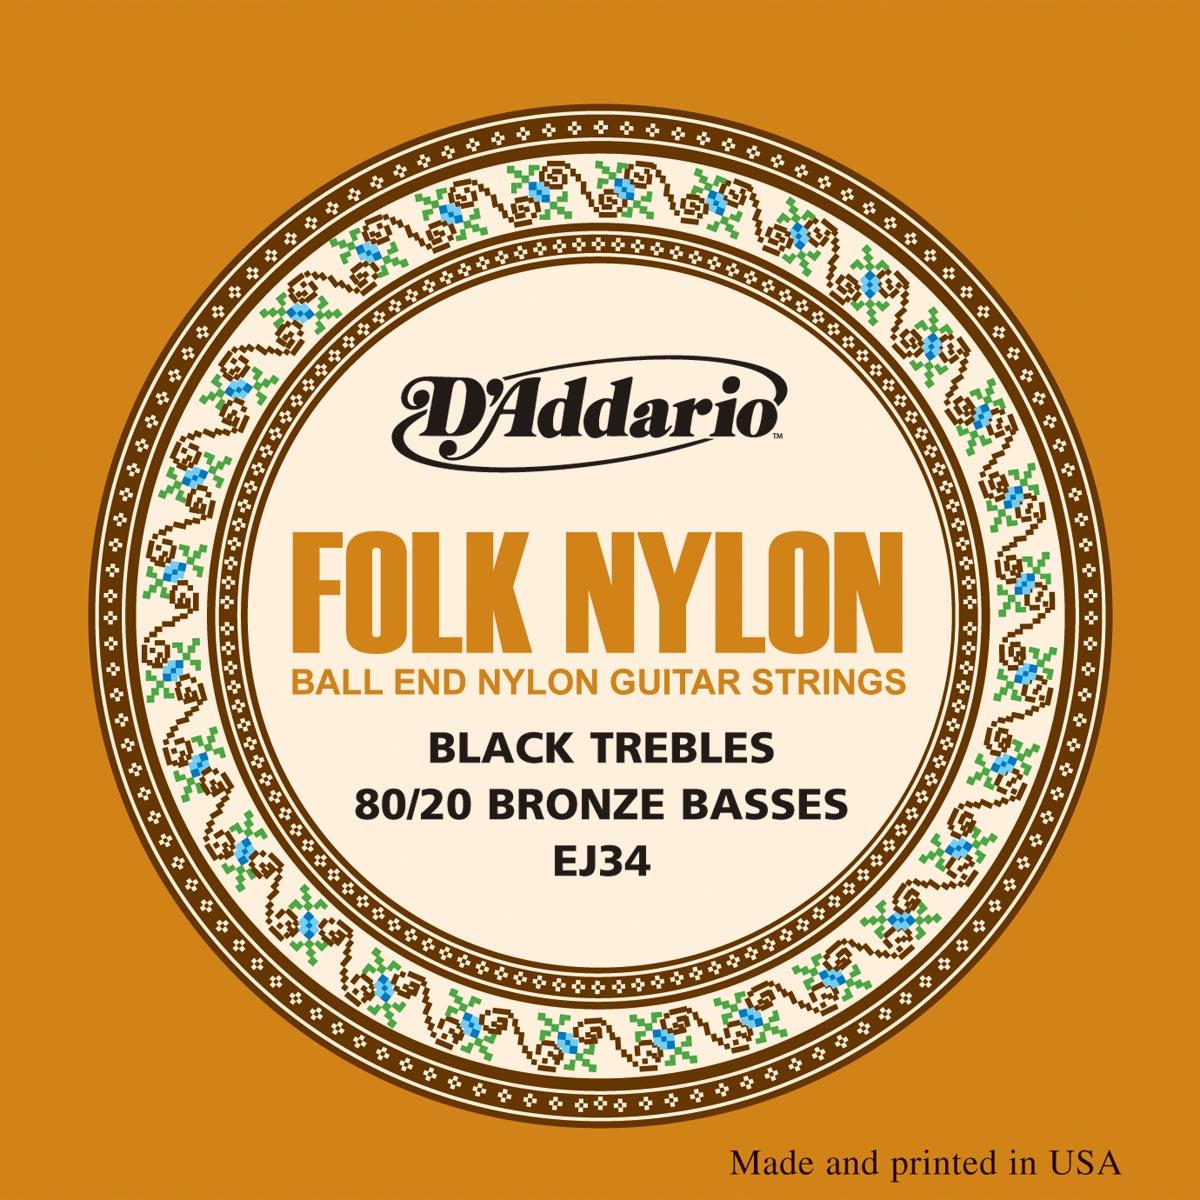 D'ADDARIO EJ34 Folk Nylon, Ball End, 80/20 Bronze/Black Nylon